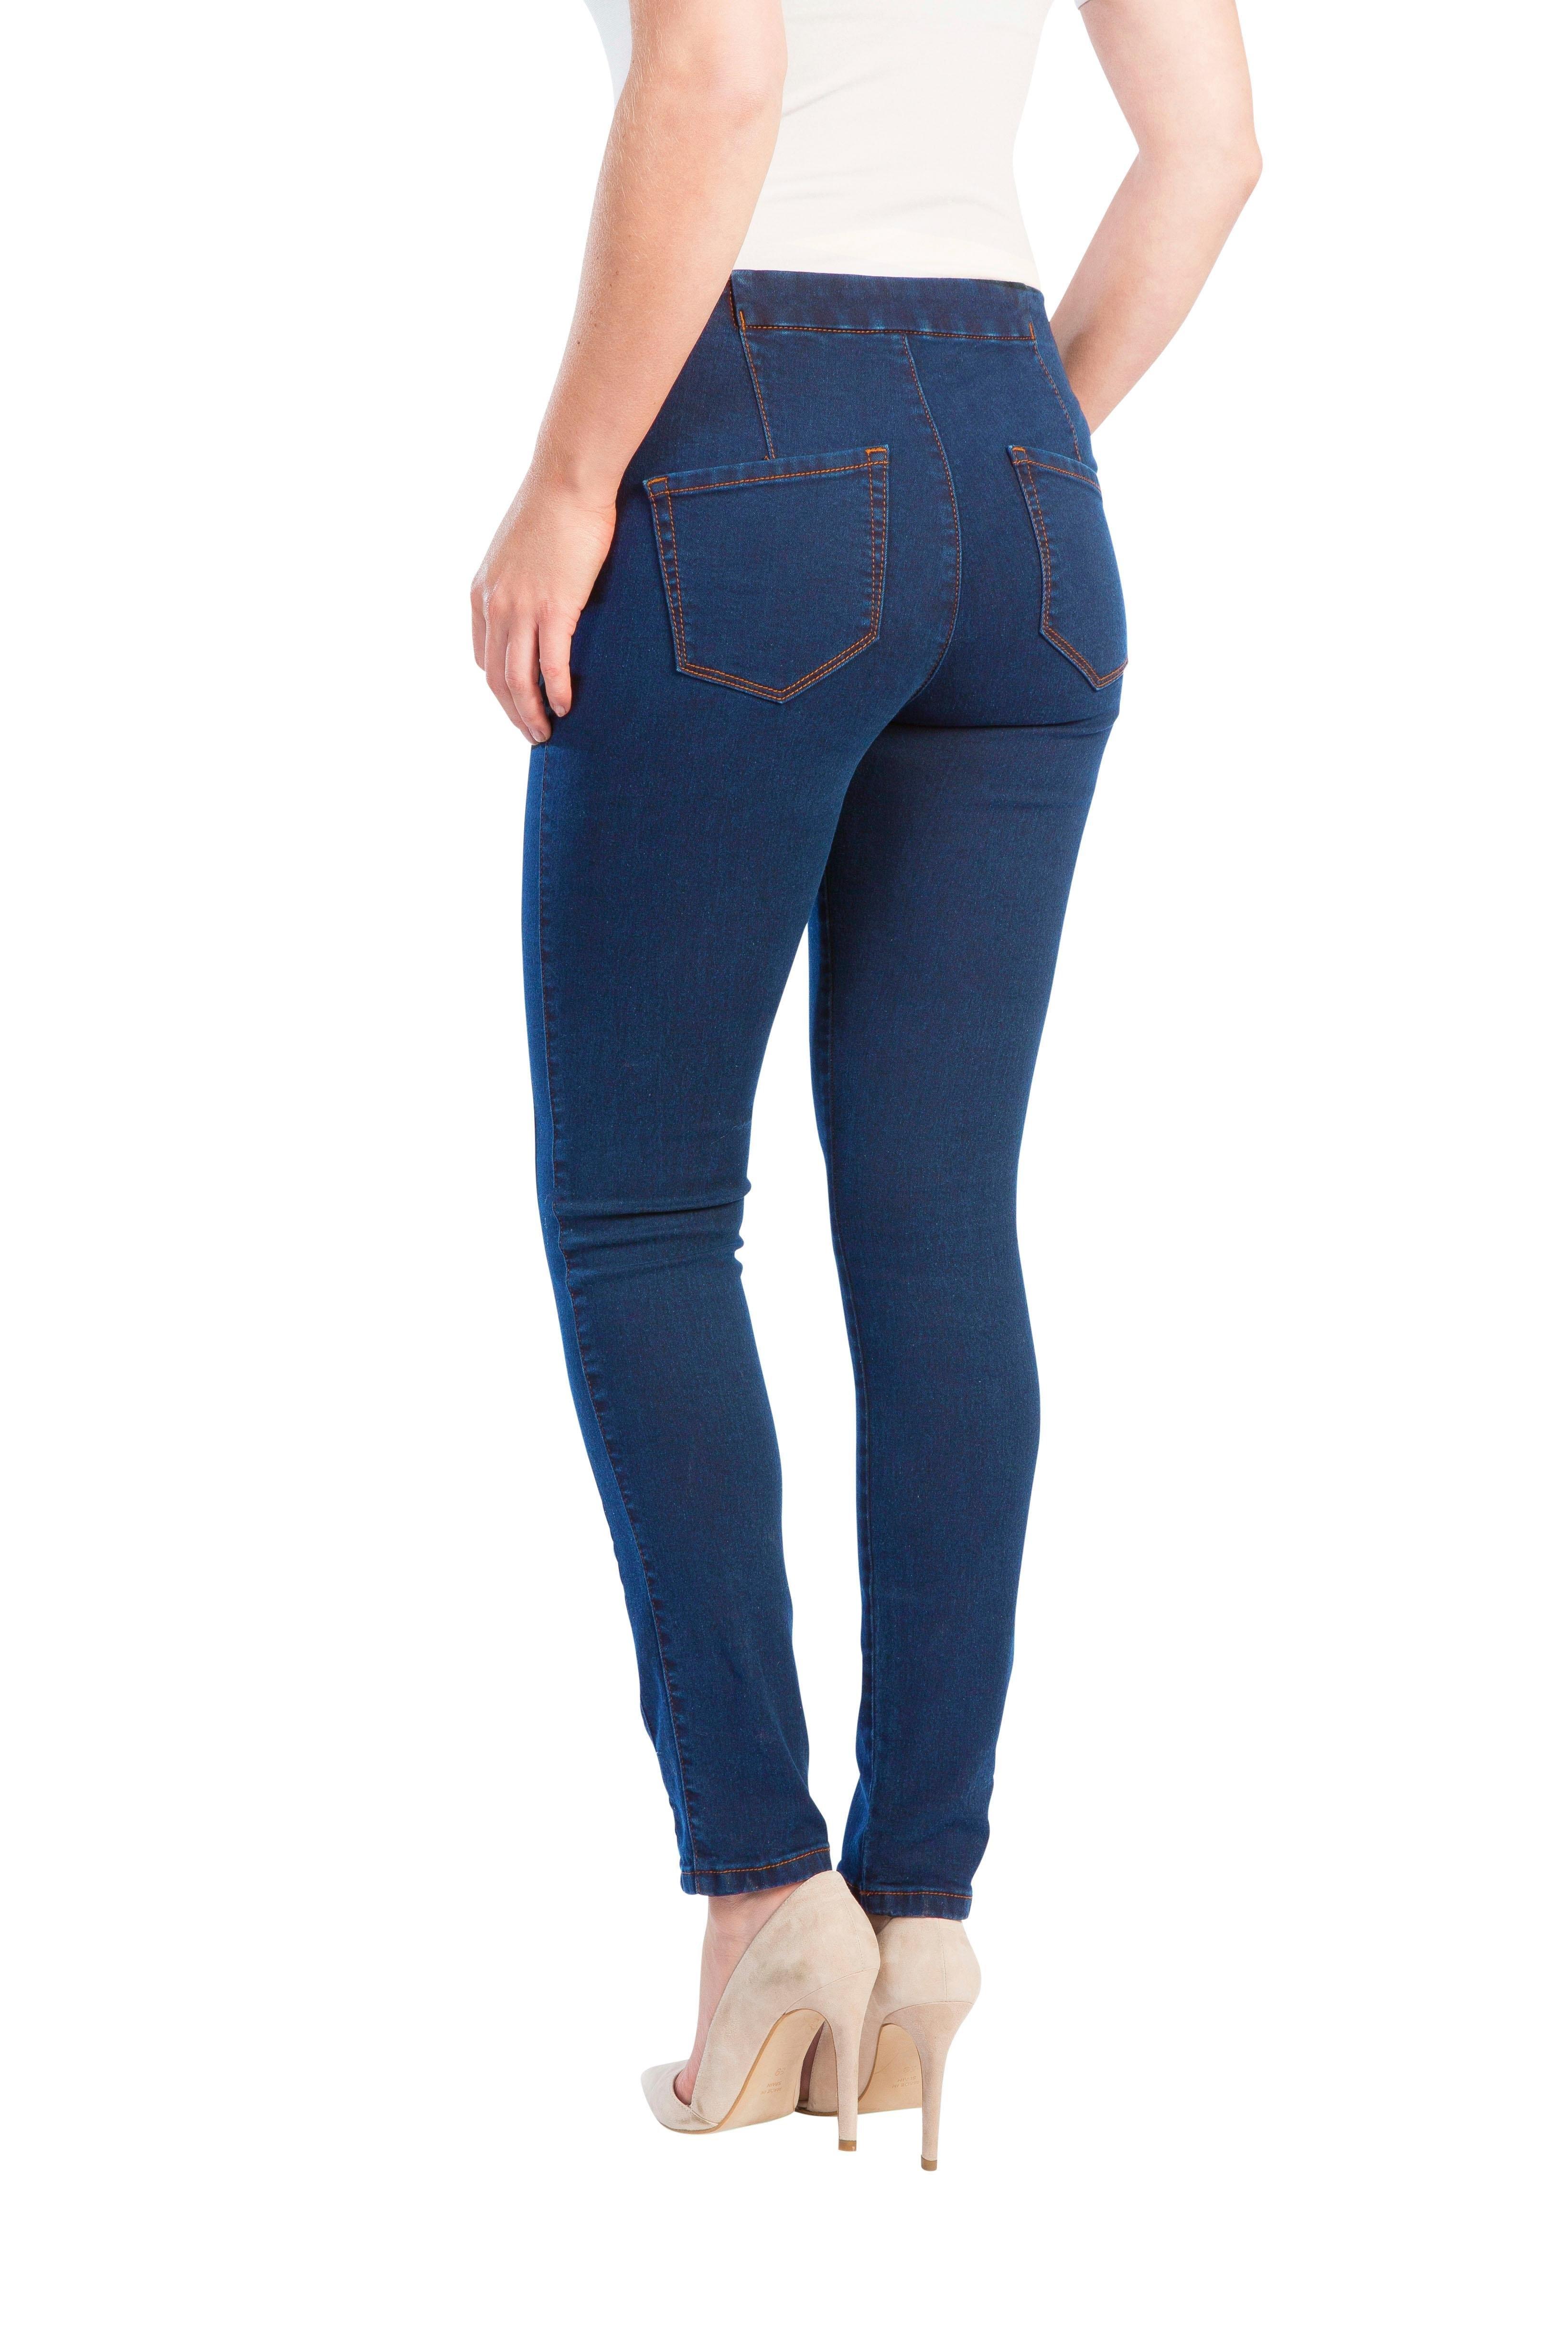 STOOKER WOMEN slim fit jeans goedkoop op otto.nl kopen